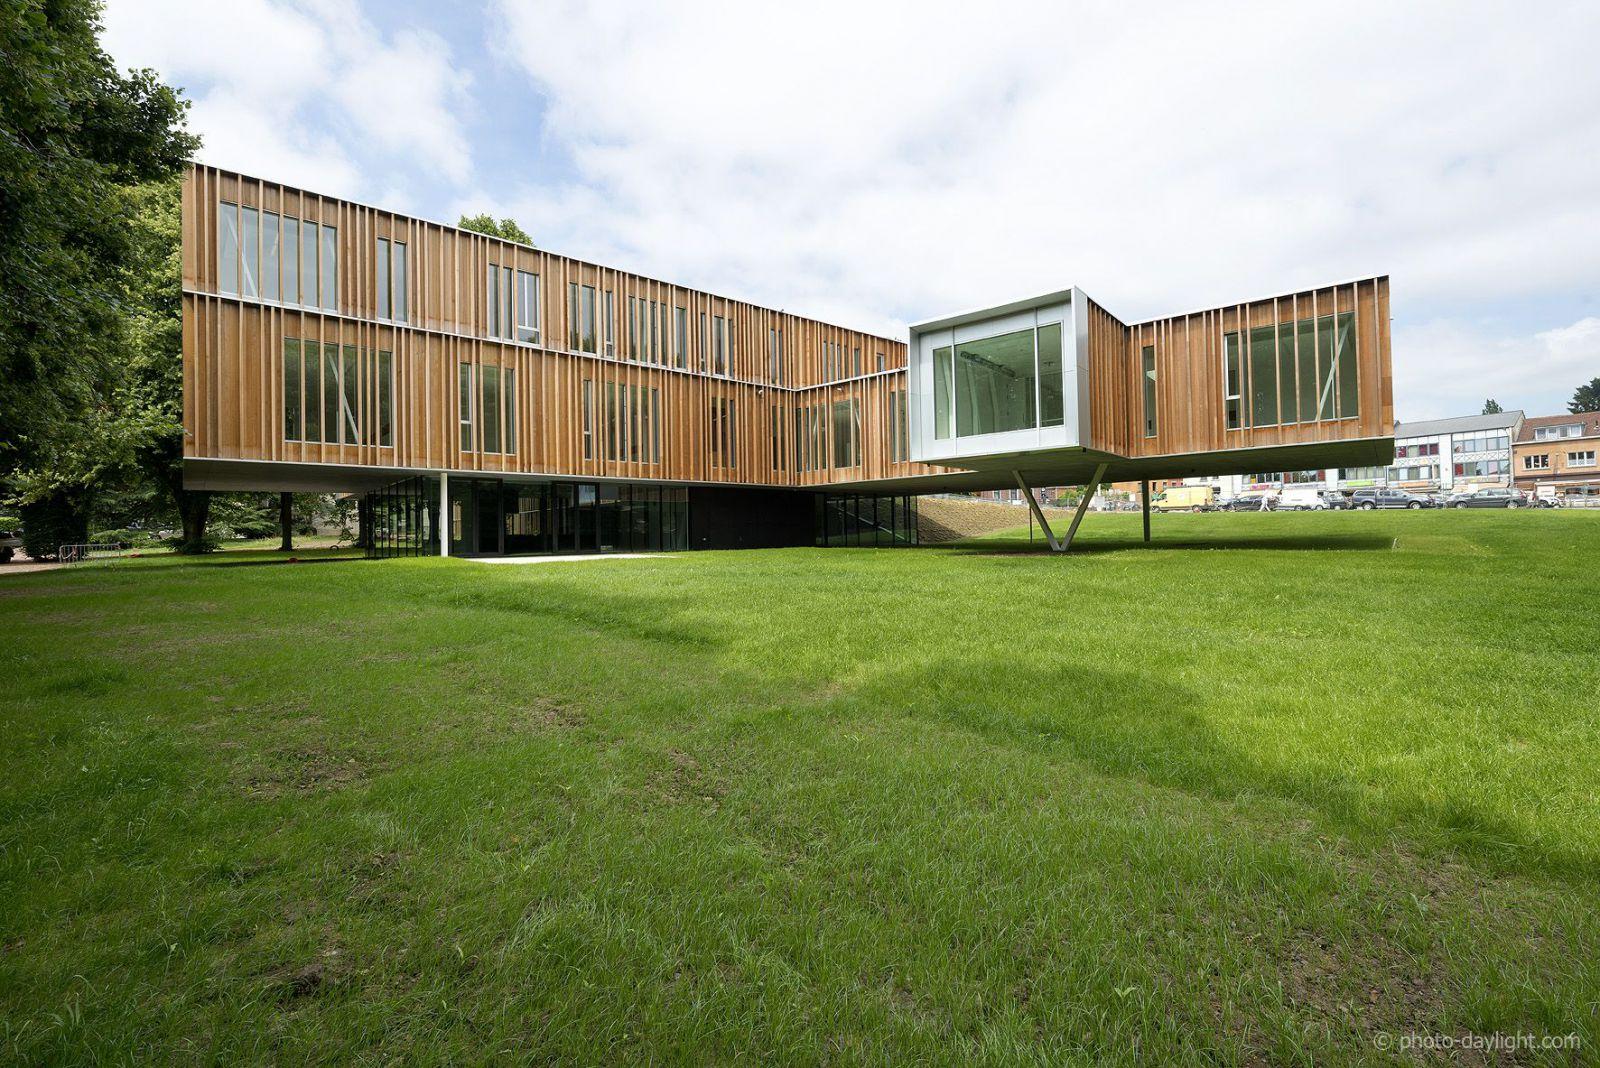 Bureau greisch concours construction acier - Piscine de montigny ...